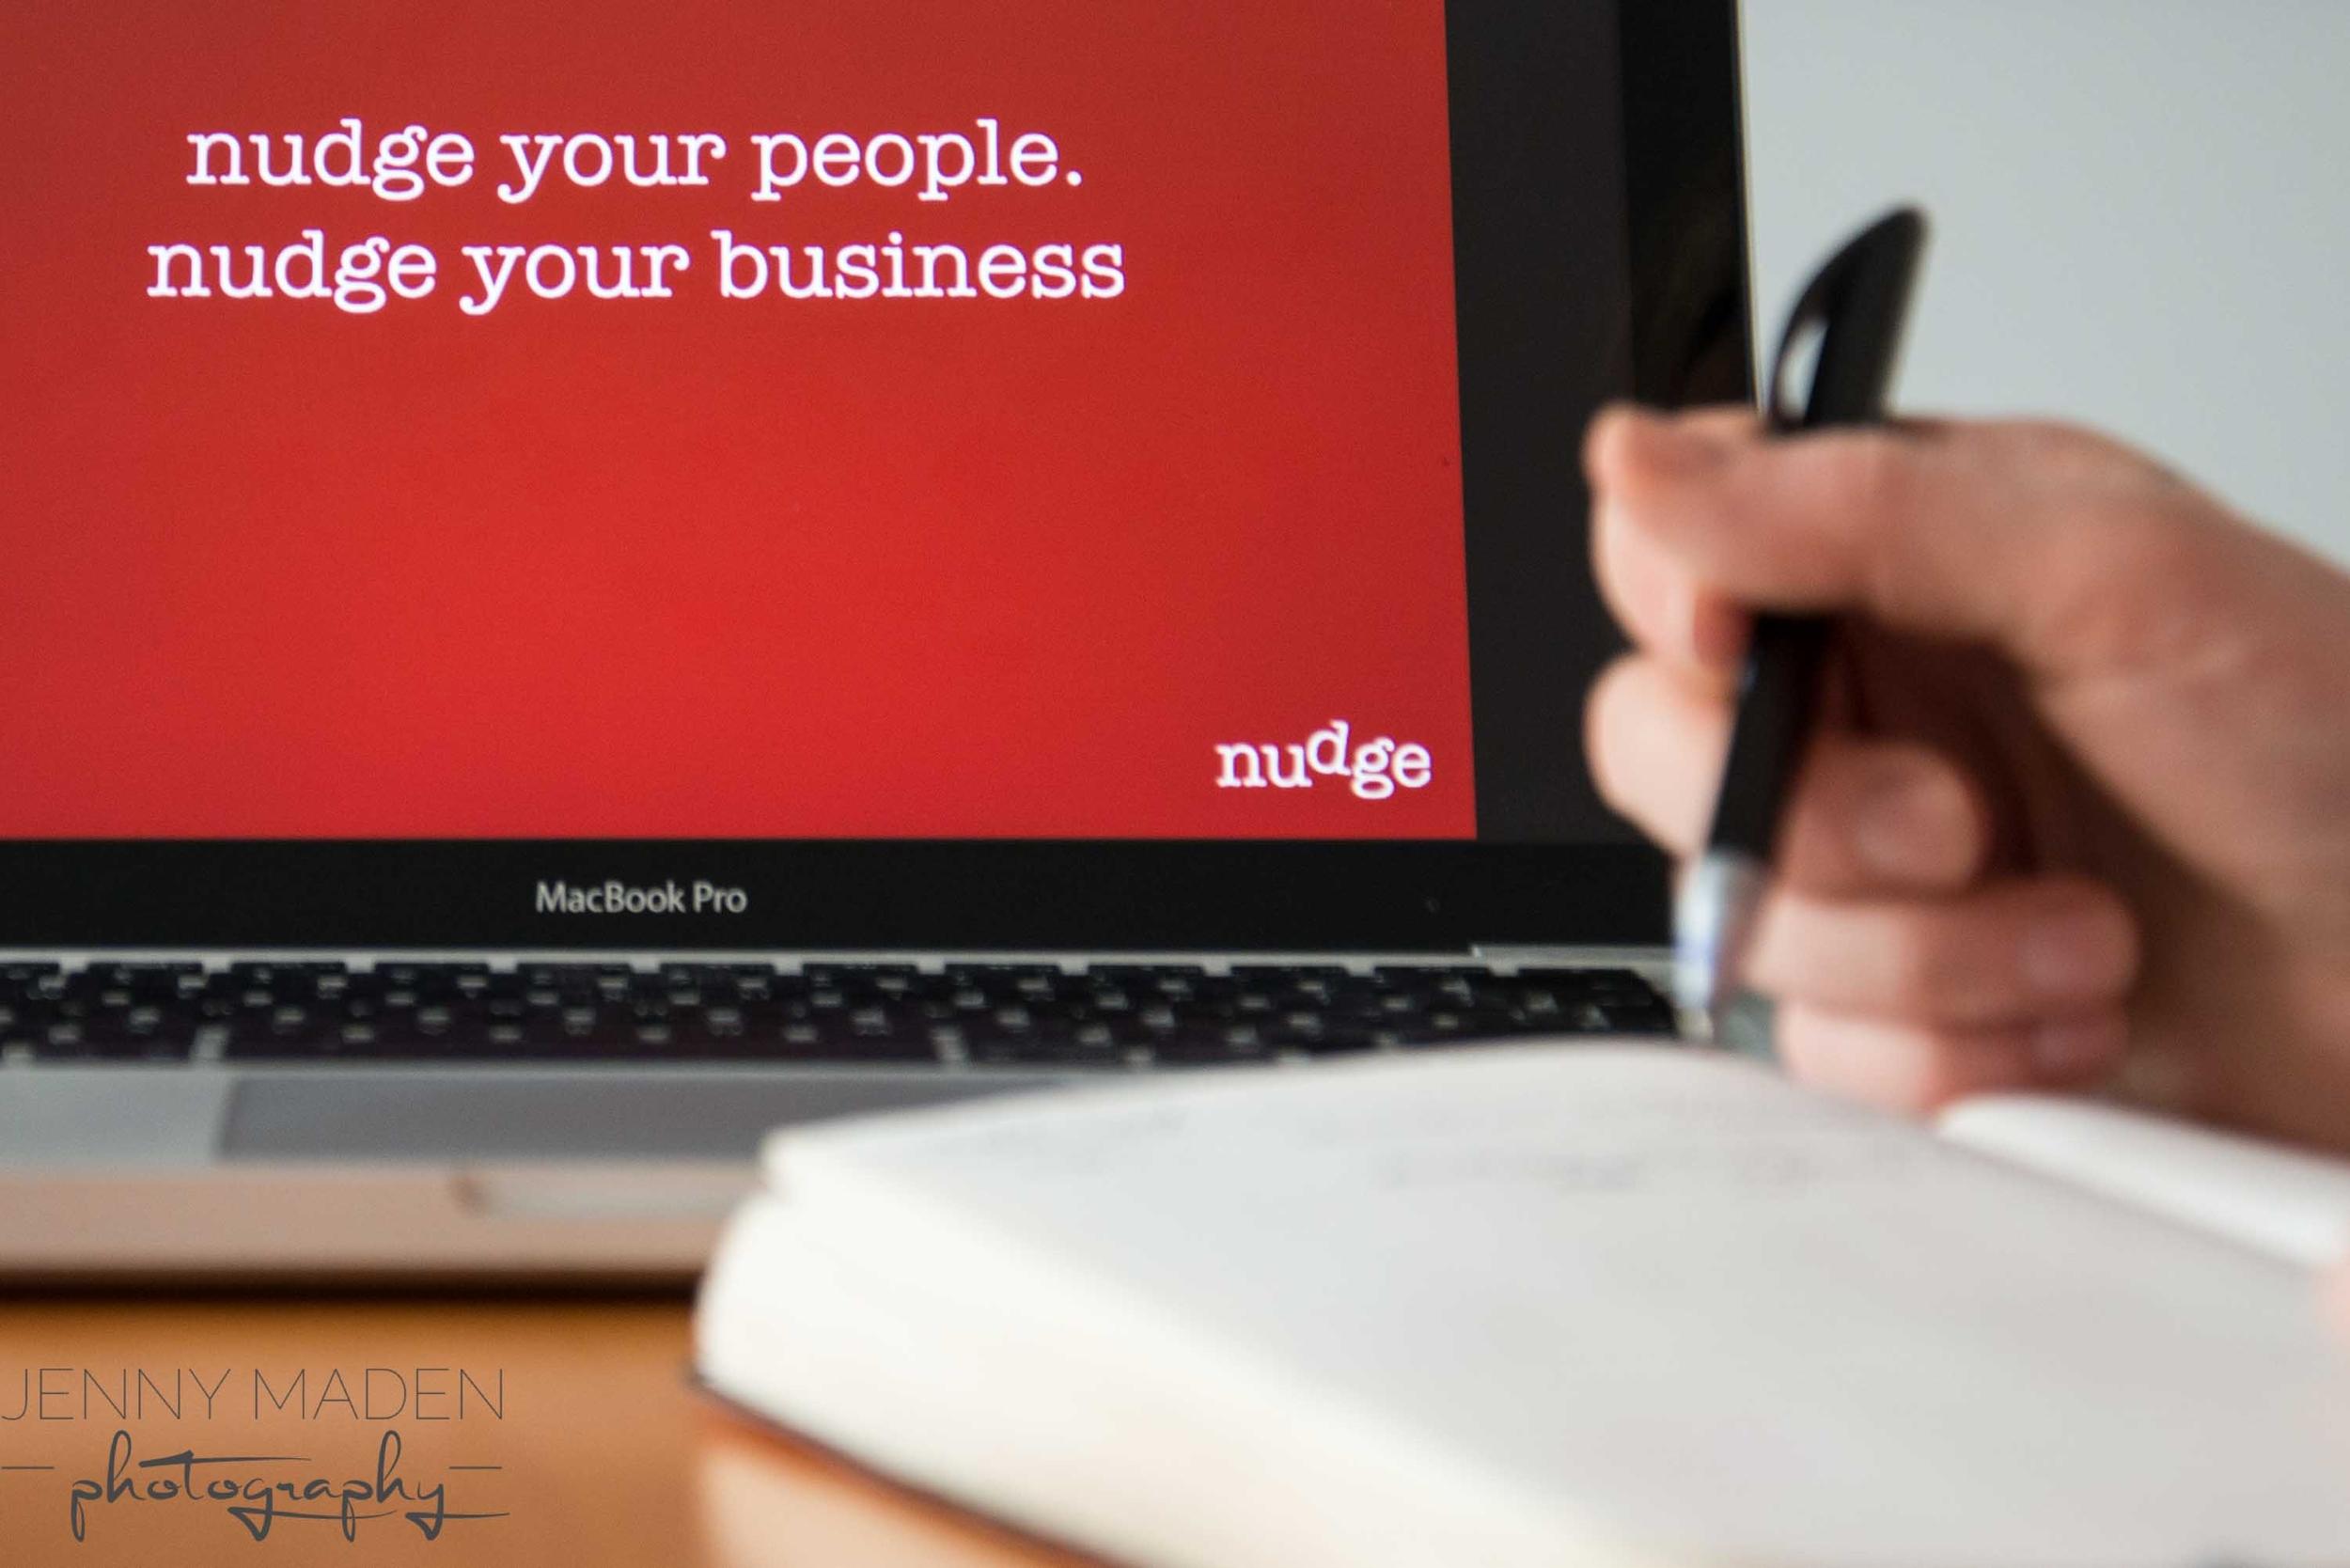 Nudge Your People 3-1-2.jpg